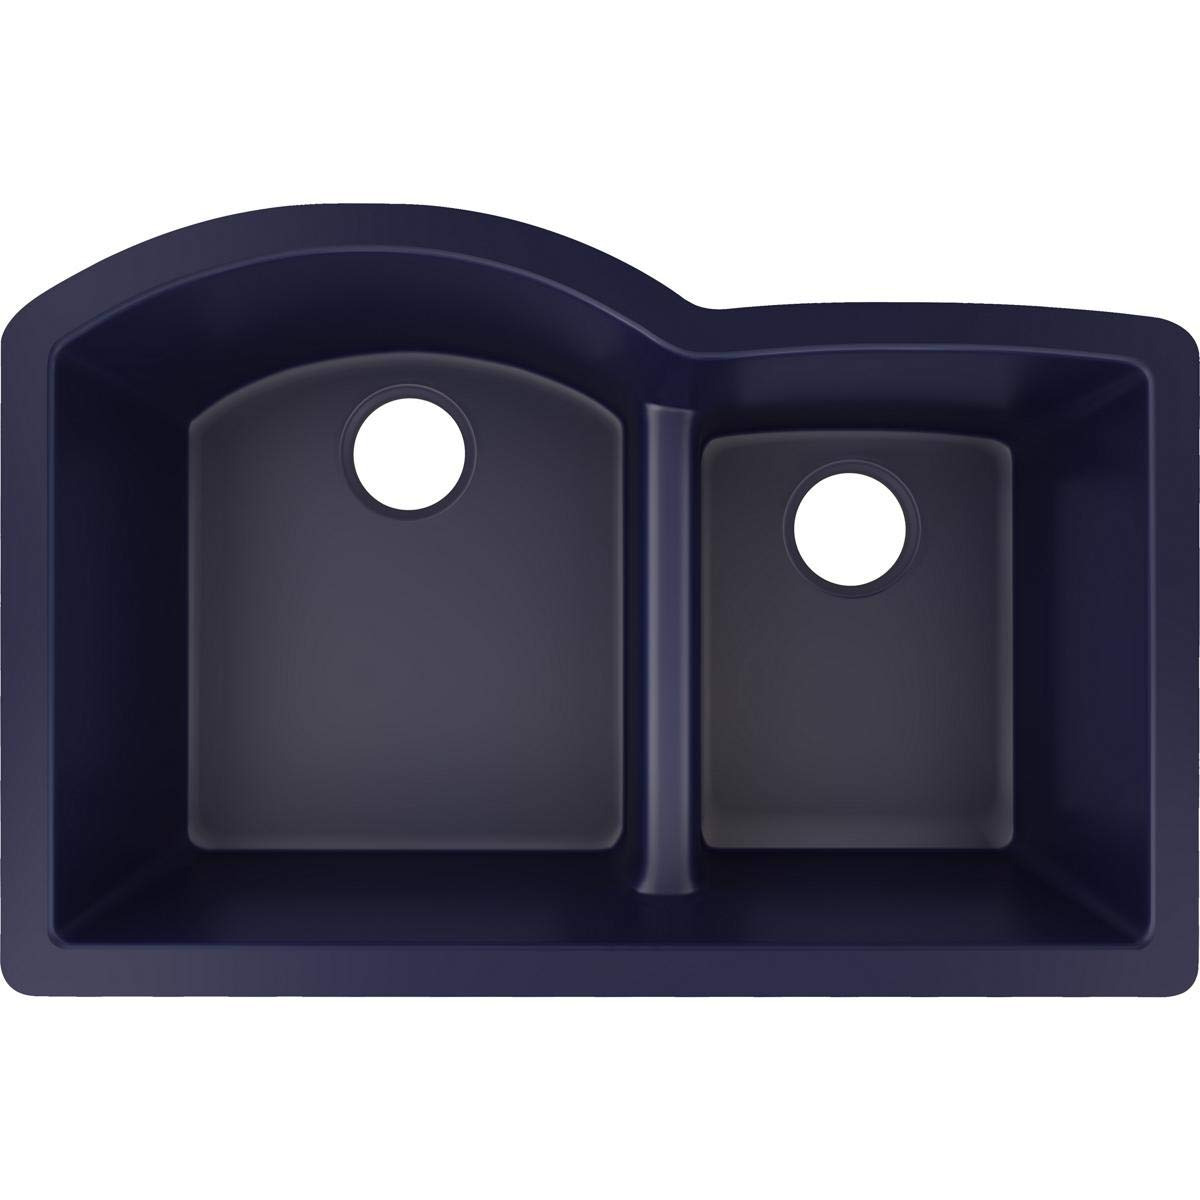 Elkay Quartz Luxe ELXHU3322RJB0 Jubilee Offset 60/40 Double Bowl Undermount Sink with Aqua Divide,